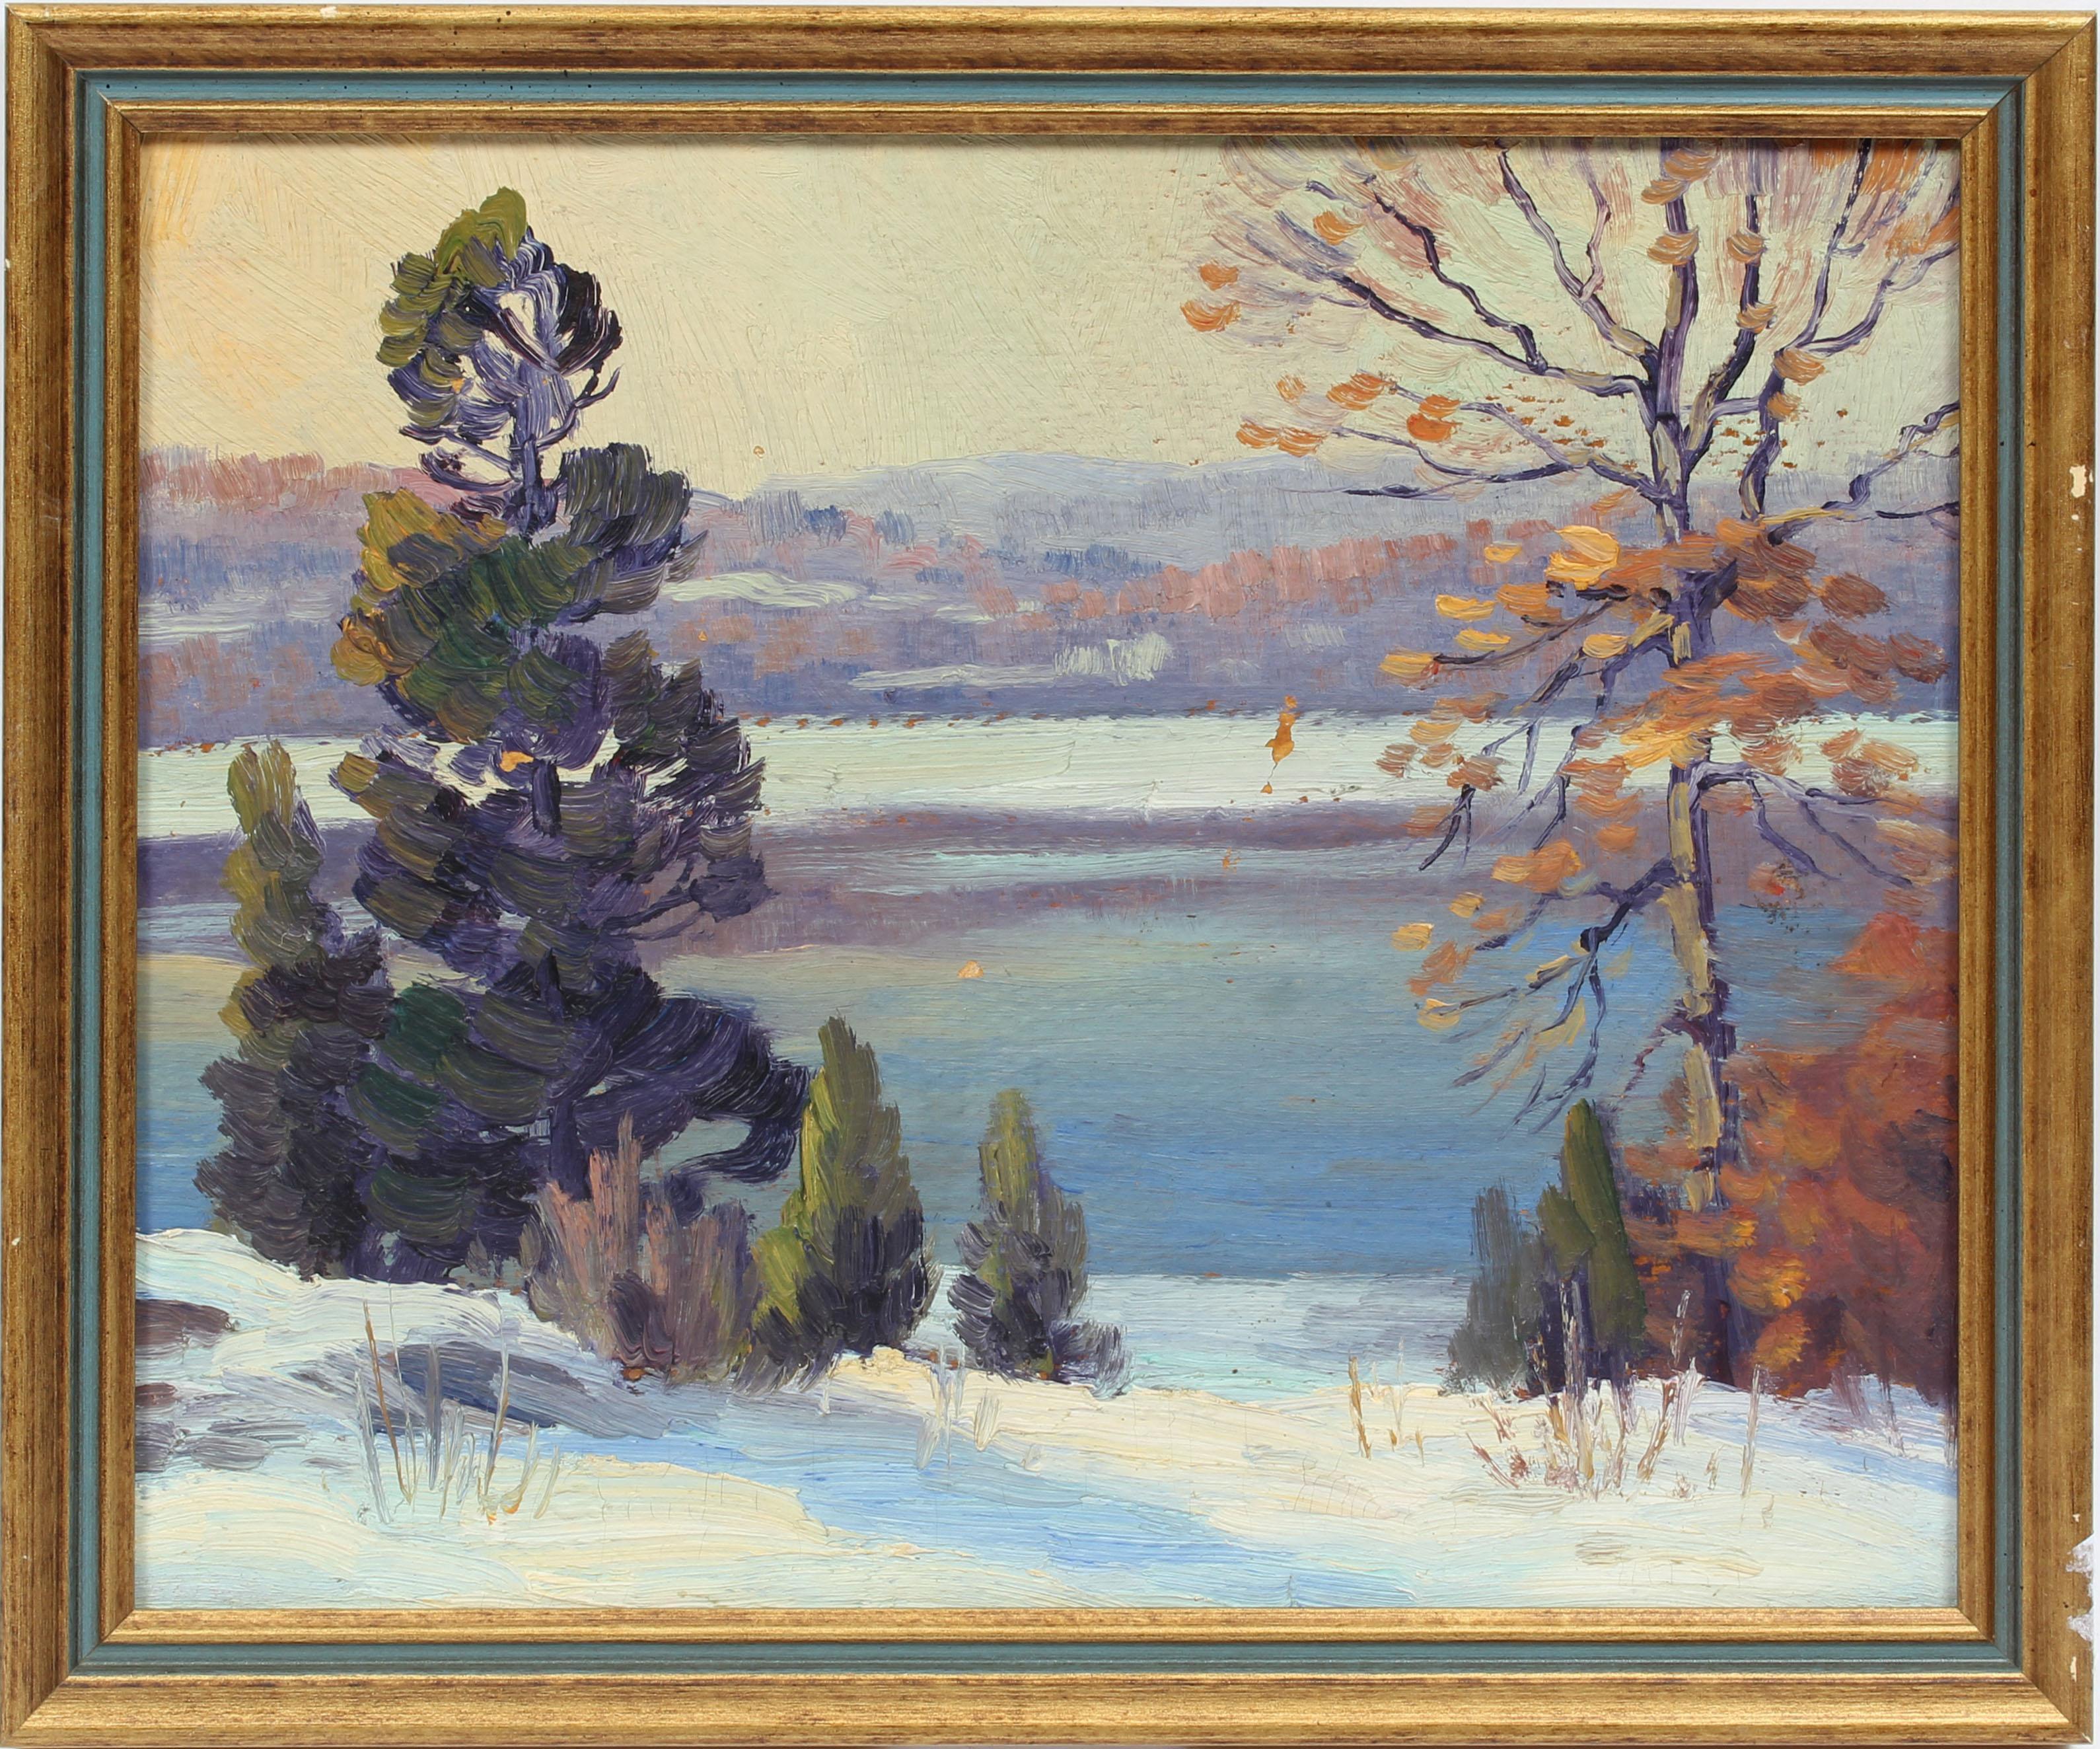 Antique American Impressionist Landscape Snow River Original Oil Painting